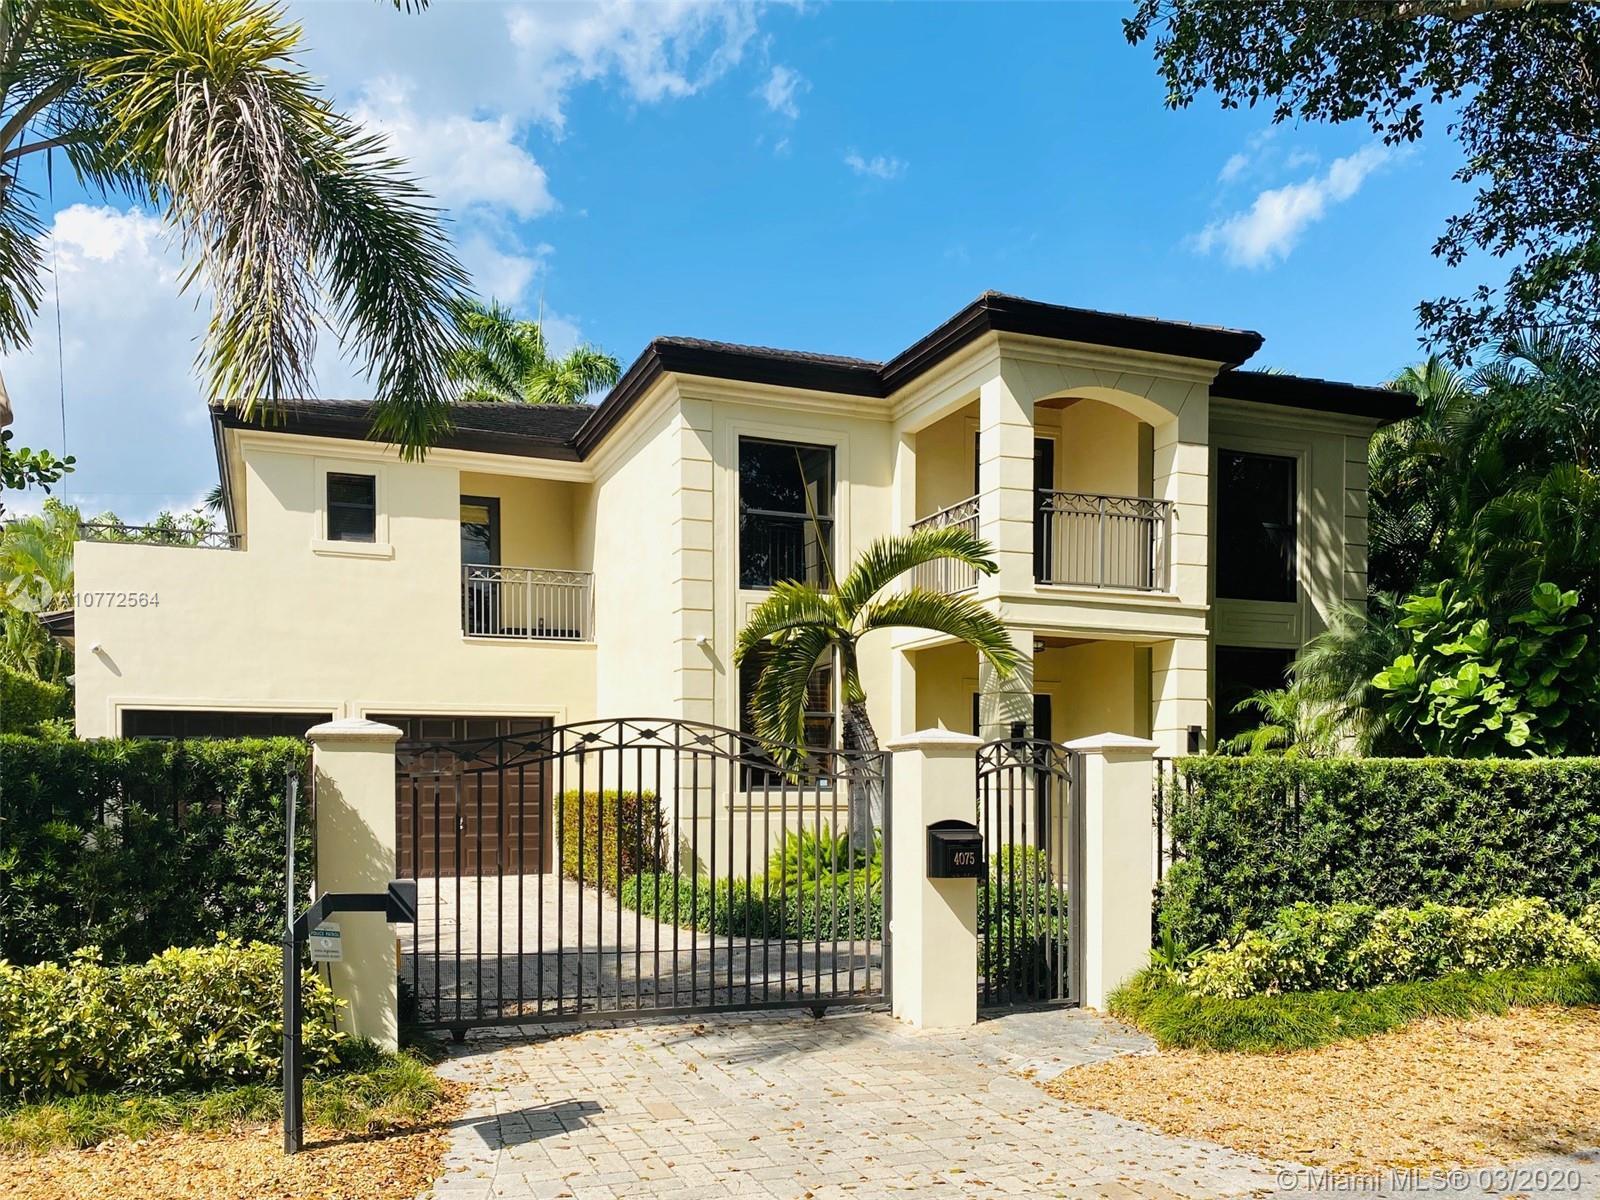 4075 Bonita Ave, Coral Gables, Florida